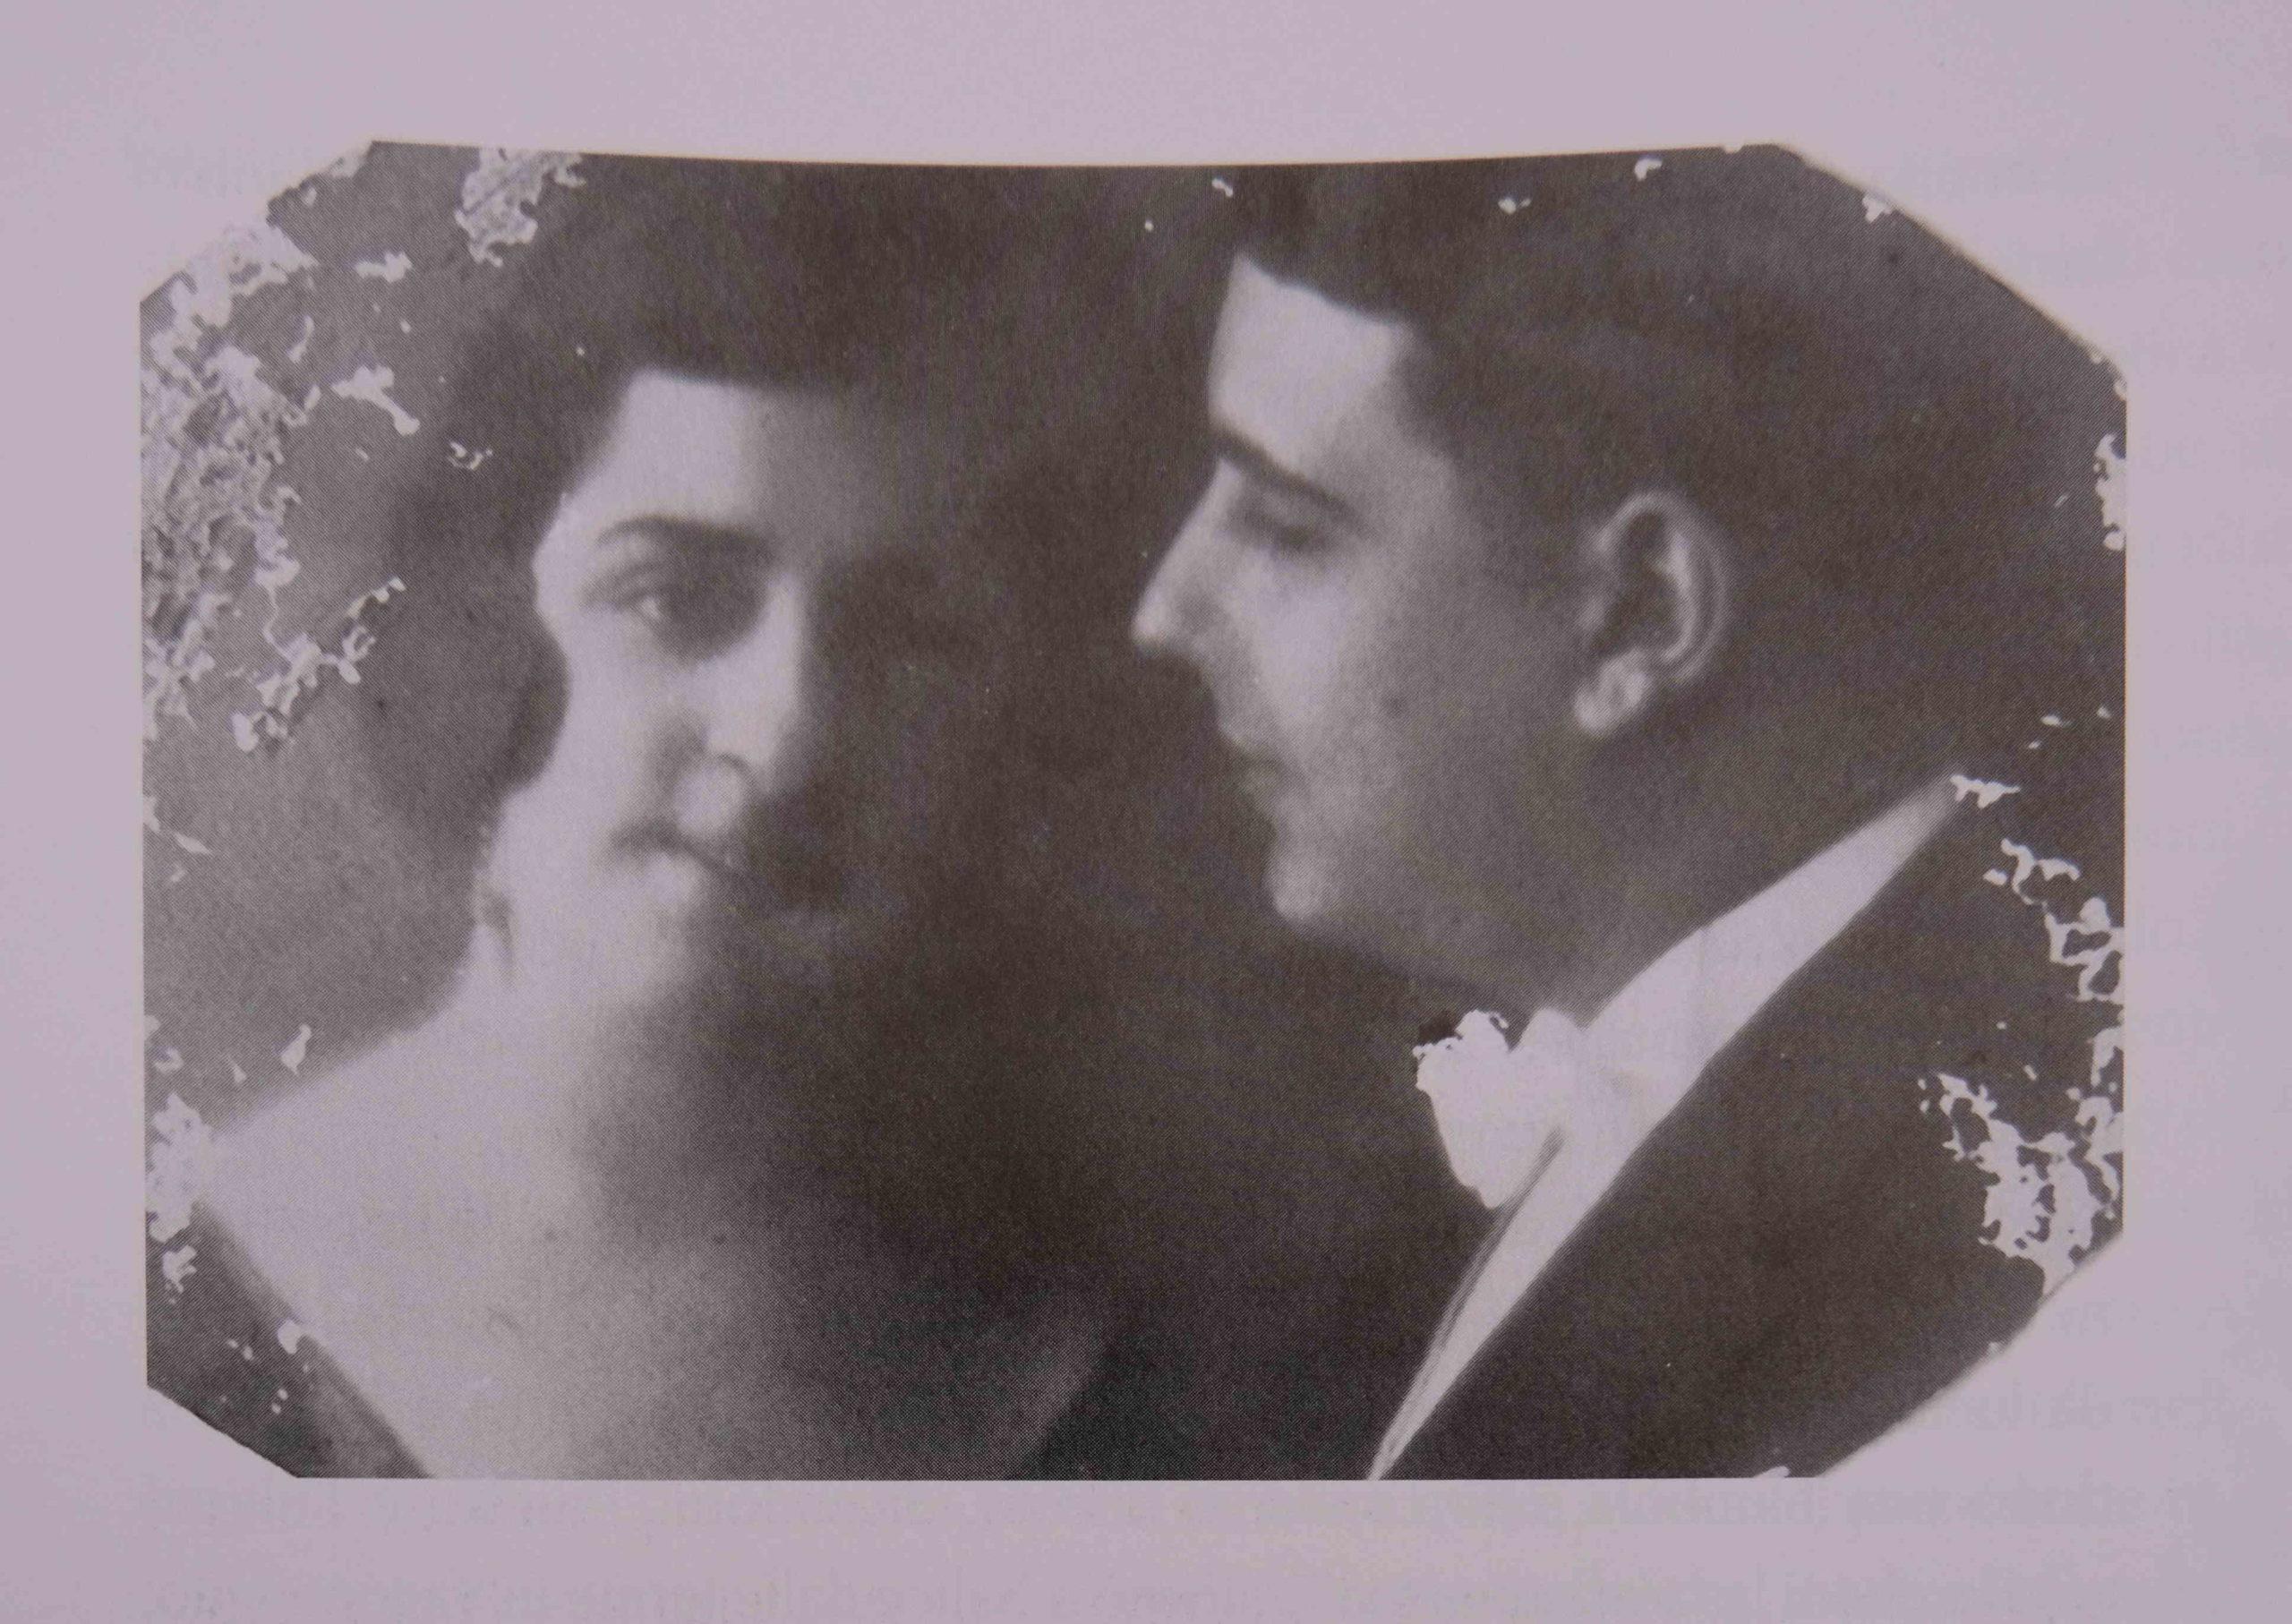 Marialuisa De Castris e Piero Leone Plantera